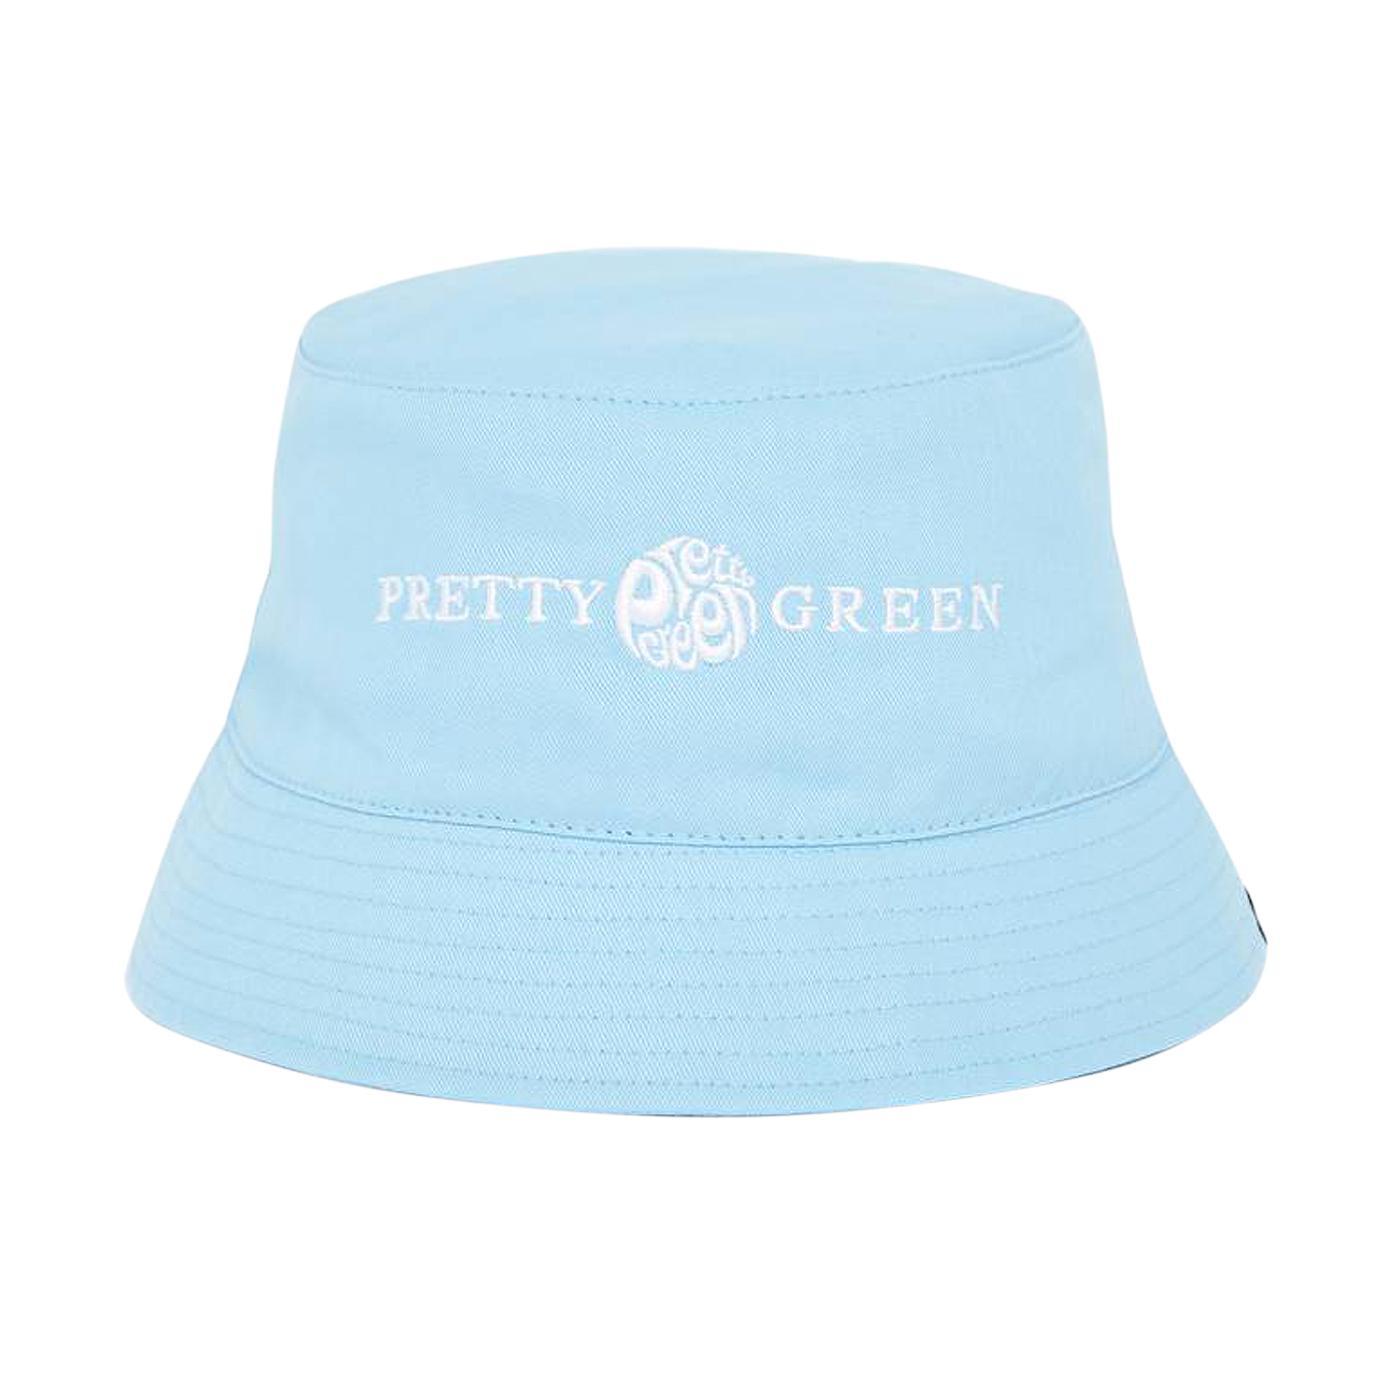 PRETTY GREEN Retro 90s Logo Bucket Hat Blue)